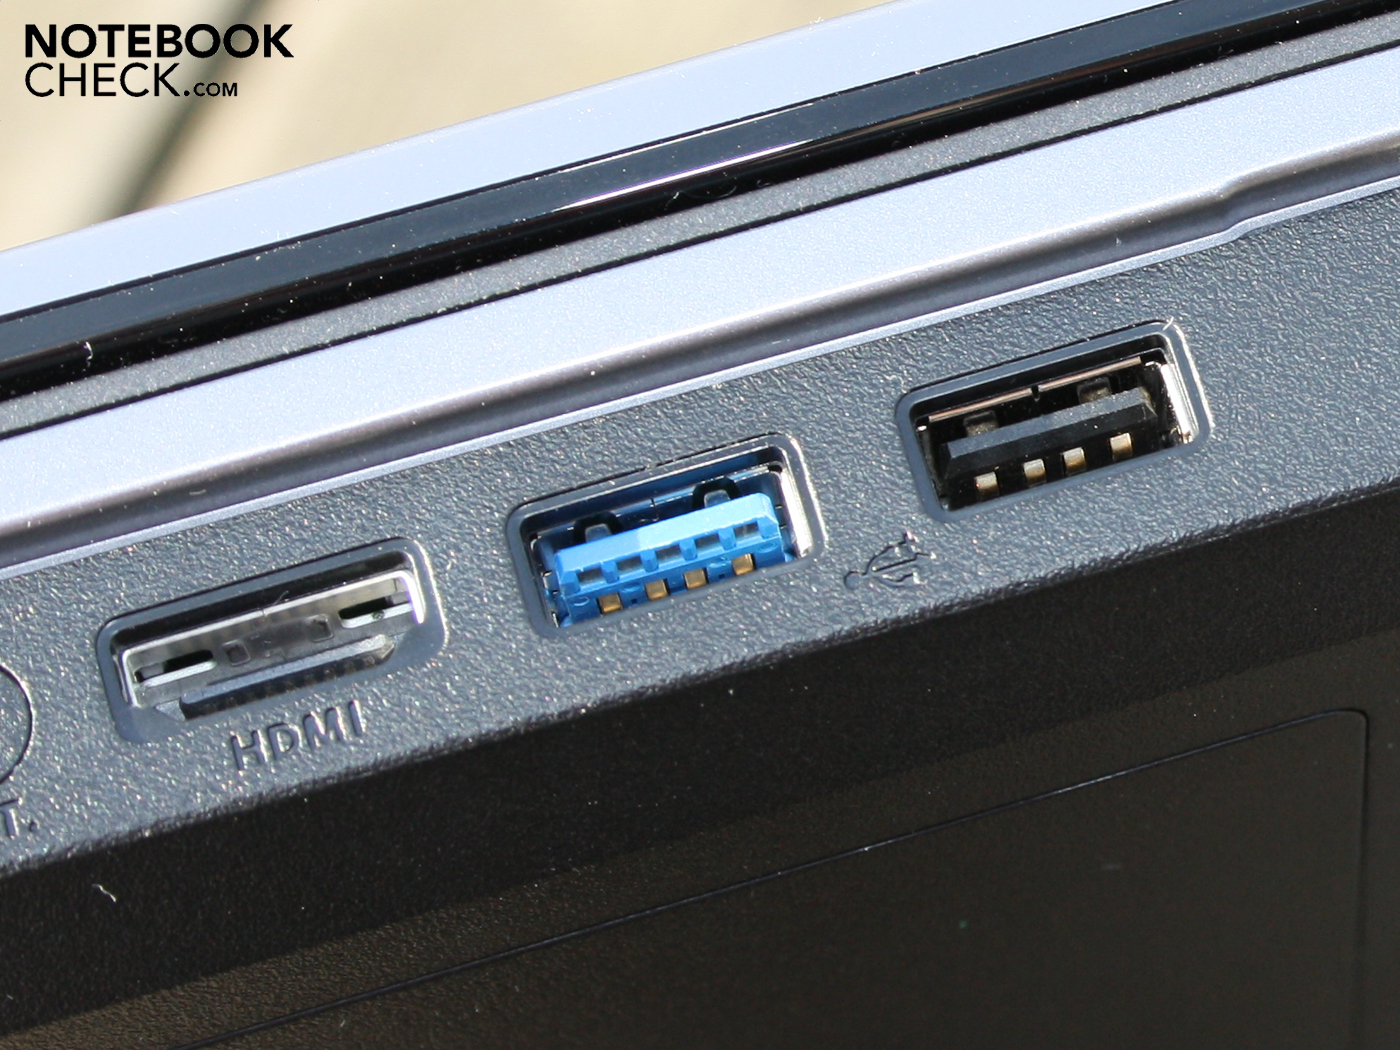 Download ASUS Laptops Drivers Free for windows 10 8 64bit 7 32bit xp